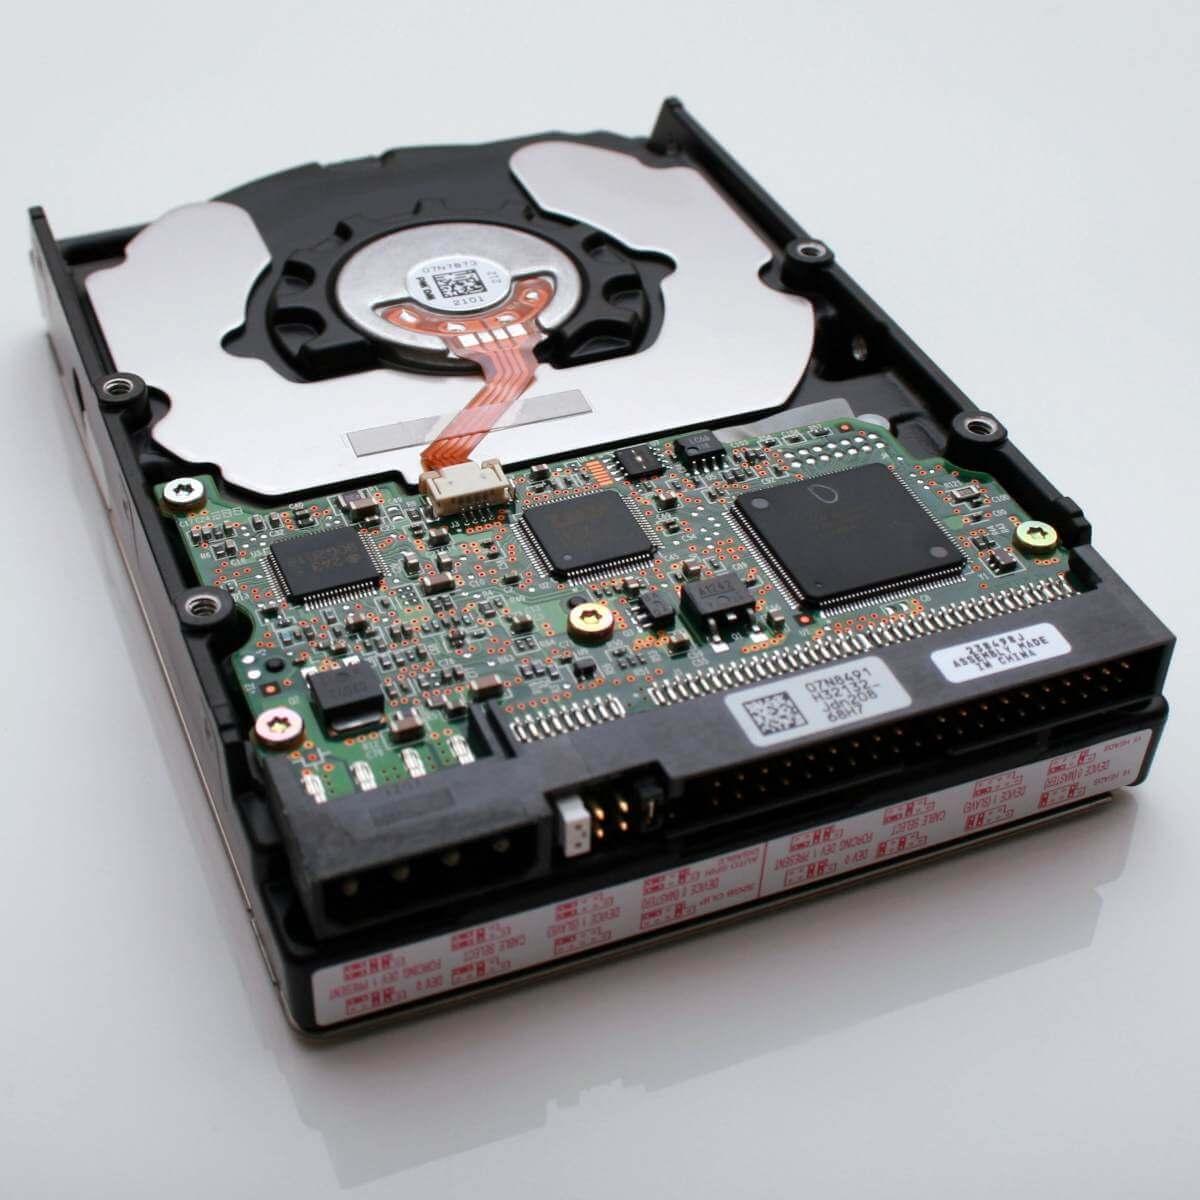 PC avtomatik olaraq BIOS'a keçir